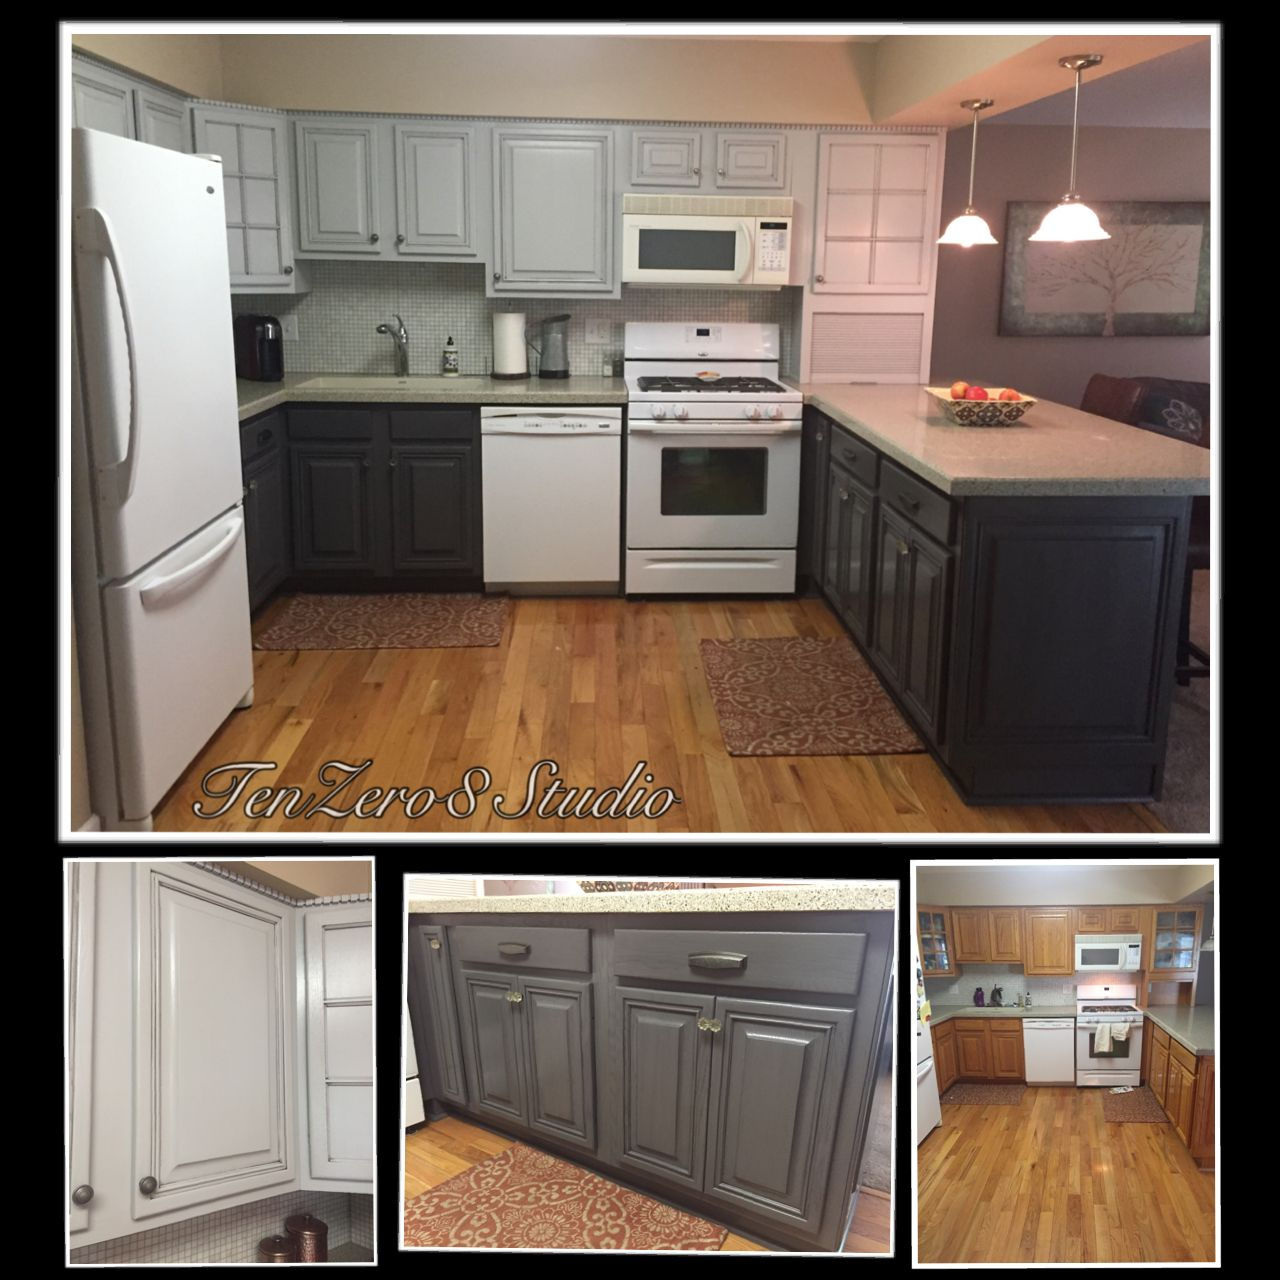 Best Kitchen By Tenzero8 Studio In General Finishes Seagull 640 x 480